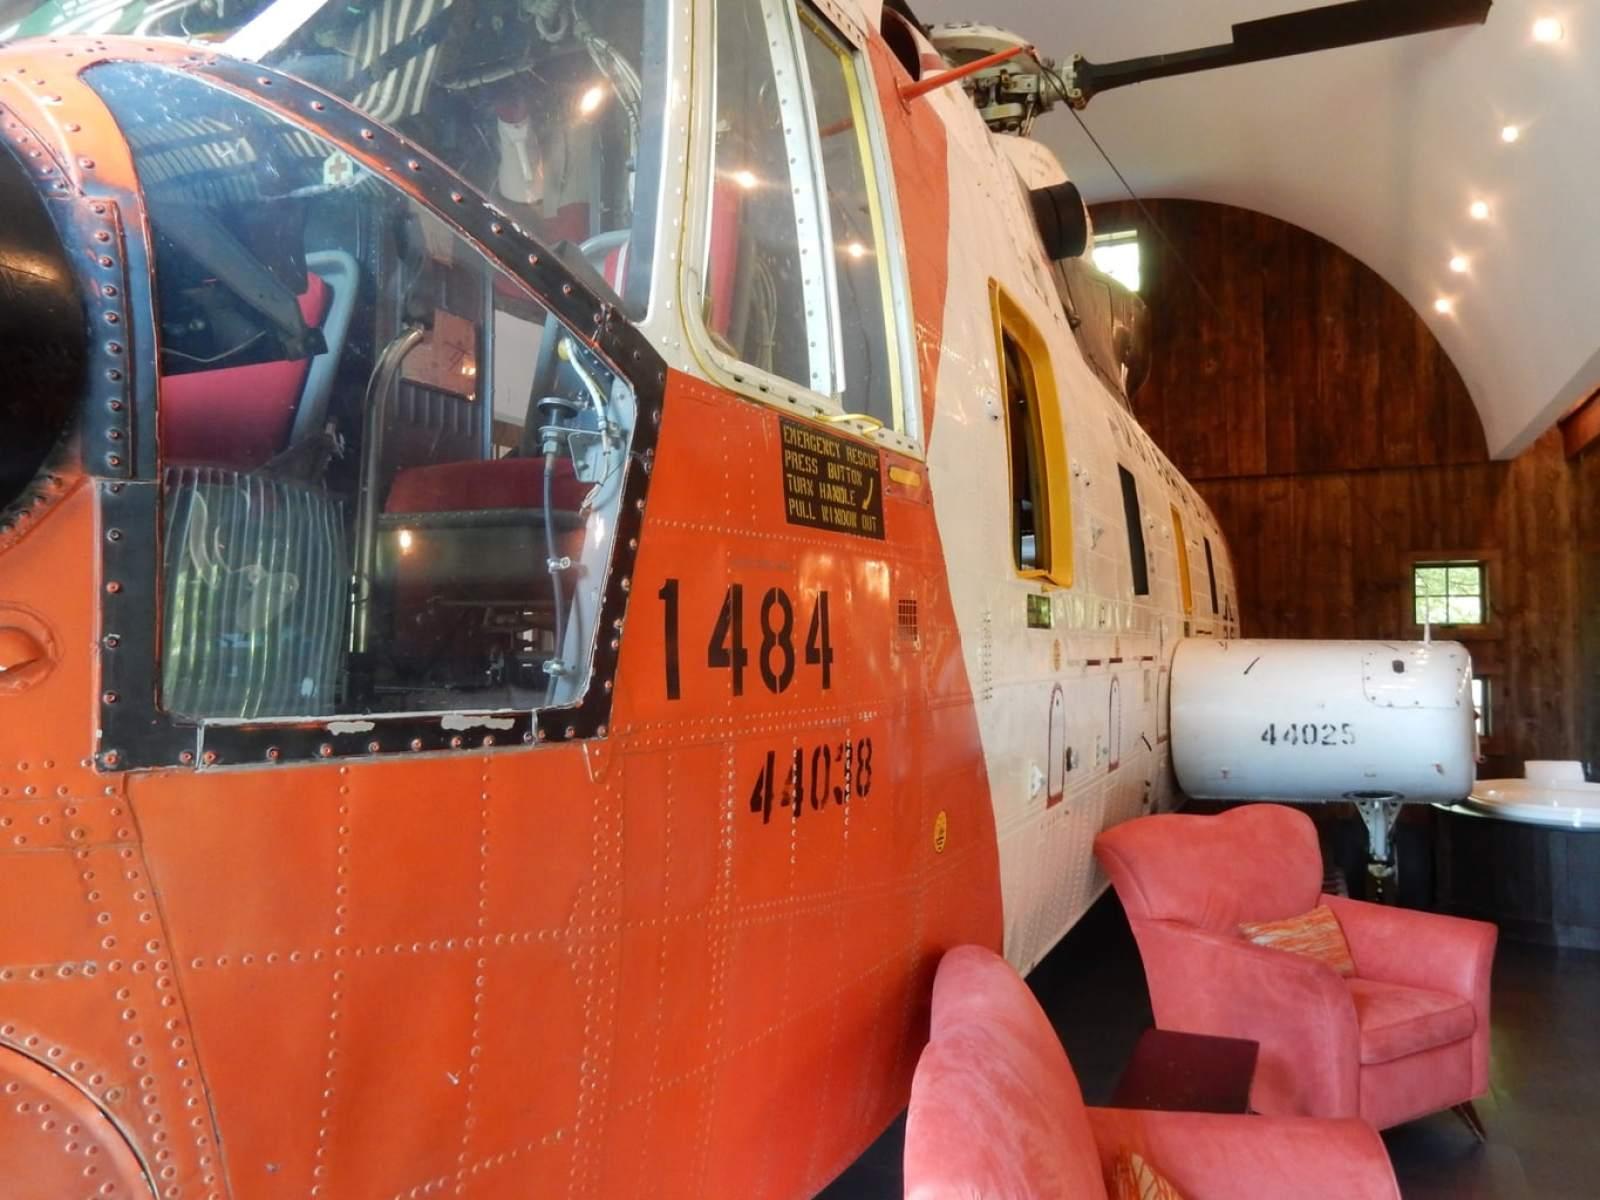 Helicopter Cottage, Winvian Farm, Morris CT